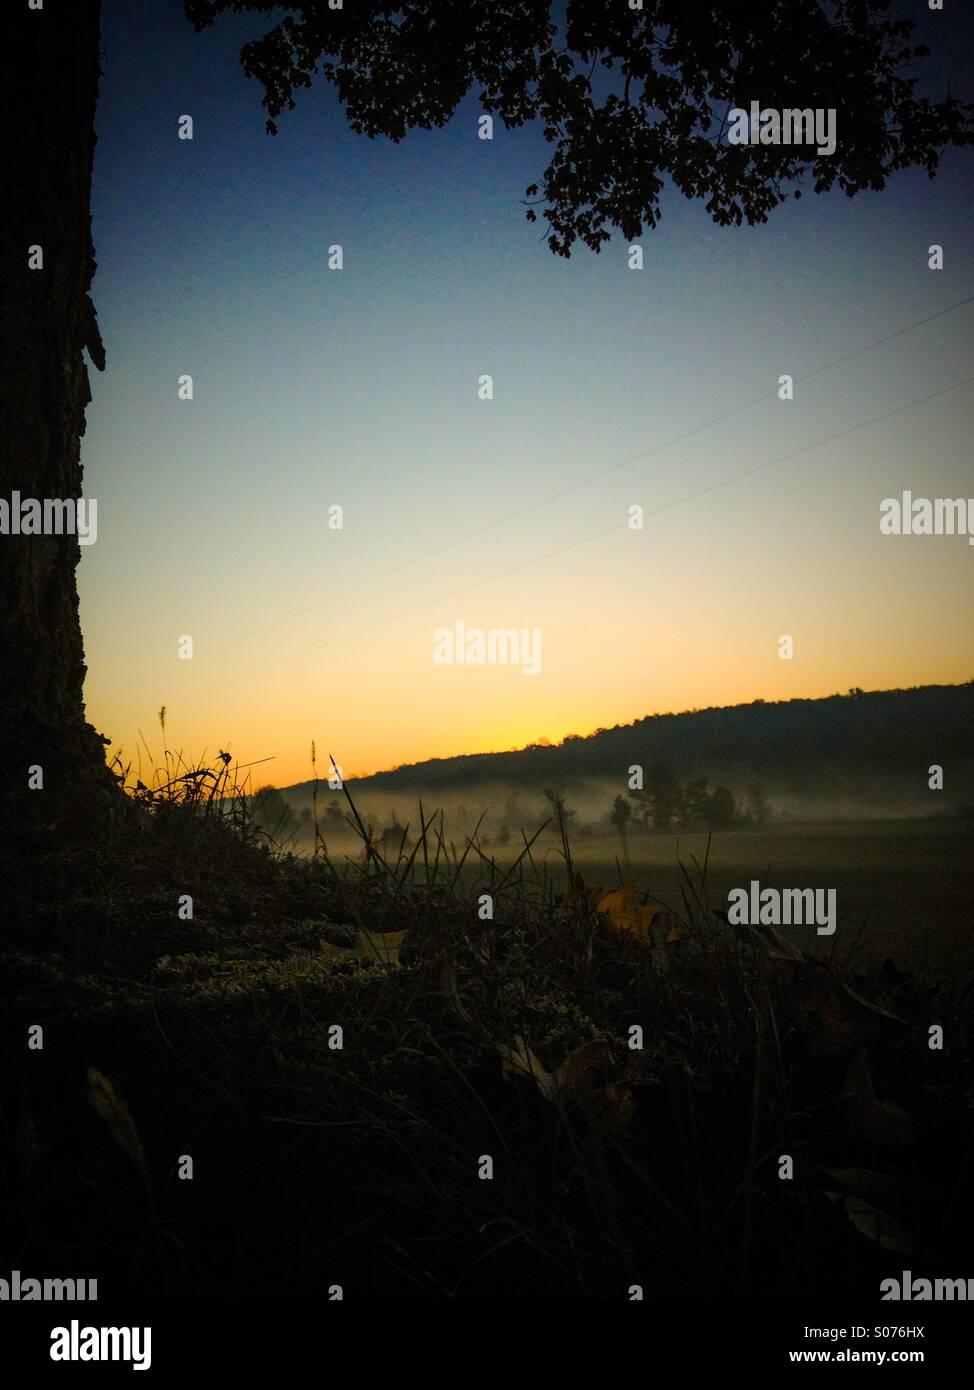 Magical almost sunrises - Stock Image